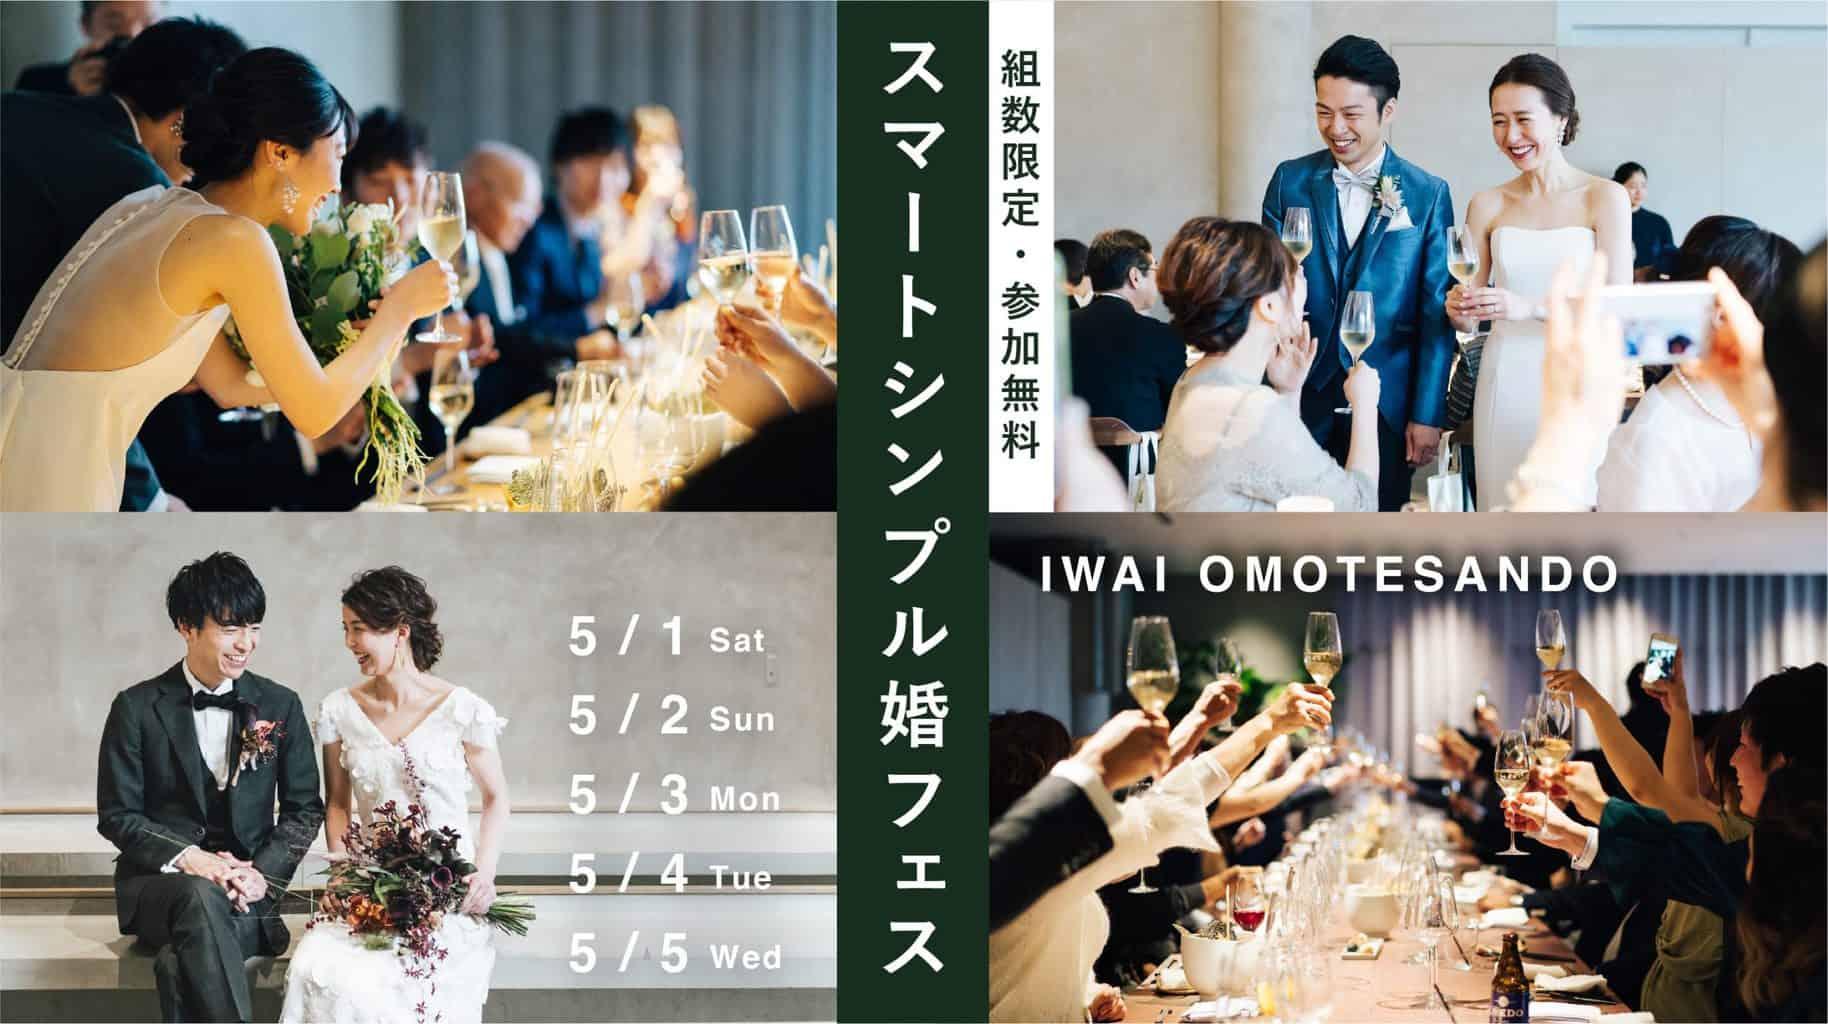 《GW限定イベント》シンプルだけど上質でリラックスできる空間で結婚式をしたいあなたへ【スマートシンプル婚フェス】のカバー写真 0.5601750547045952